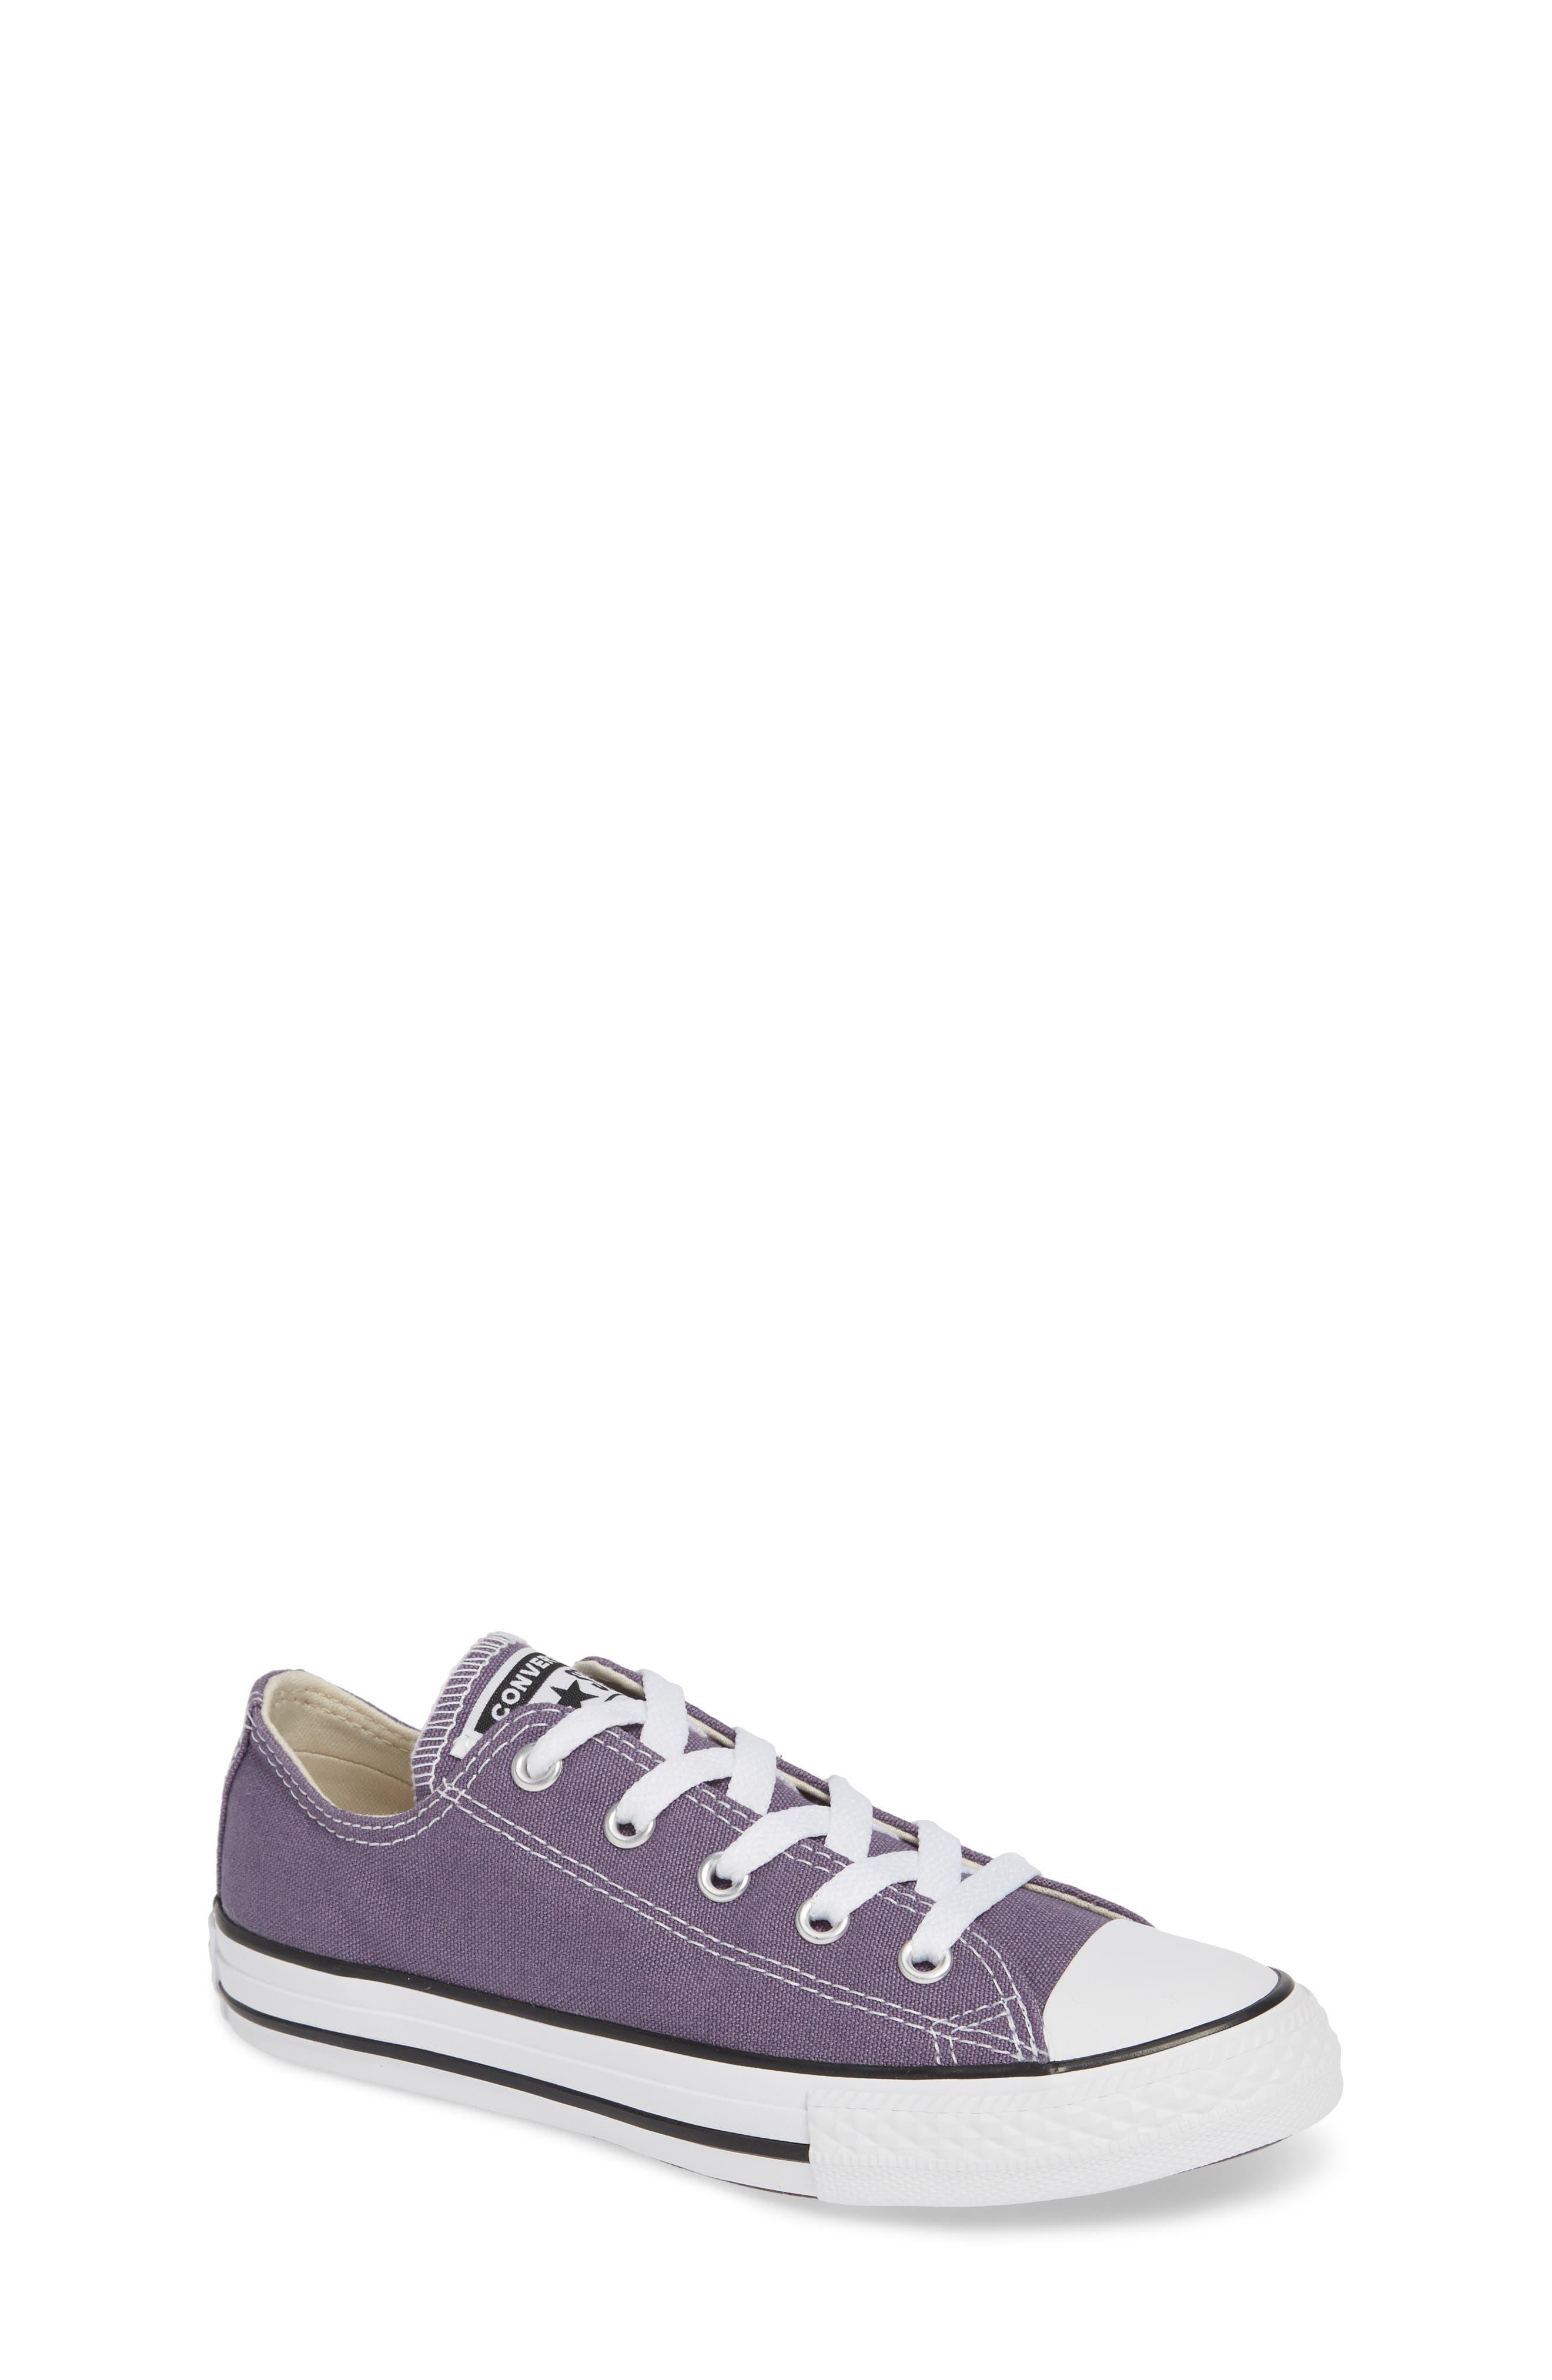 Toddler Converse Chuck Taylor Sneaker Size 2 M  Purple